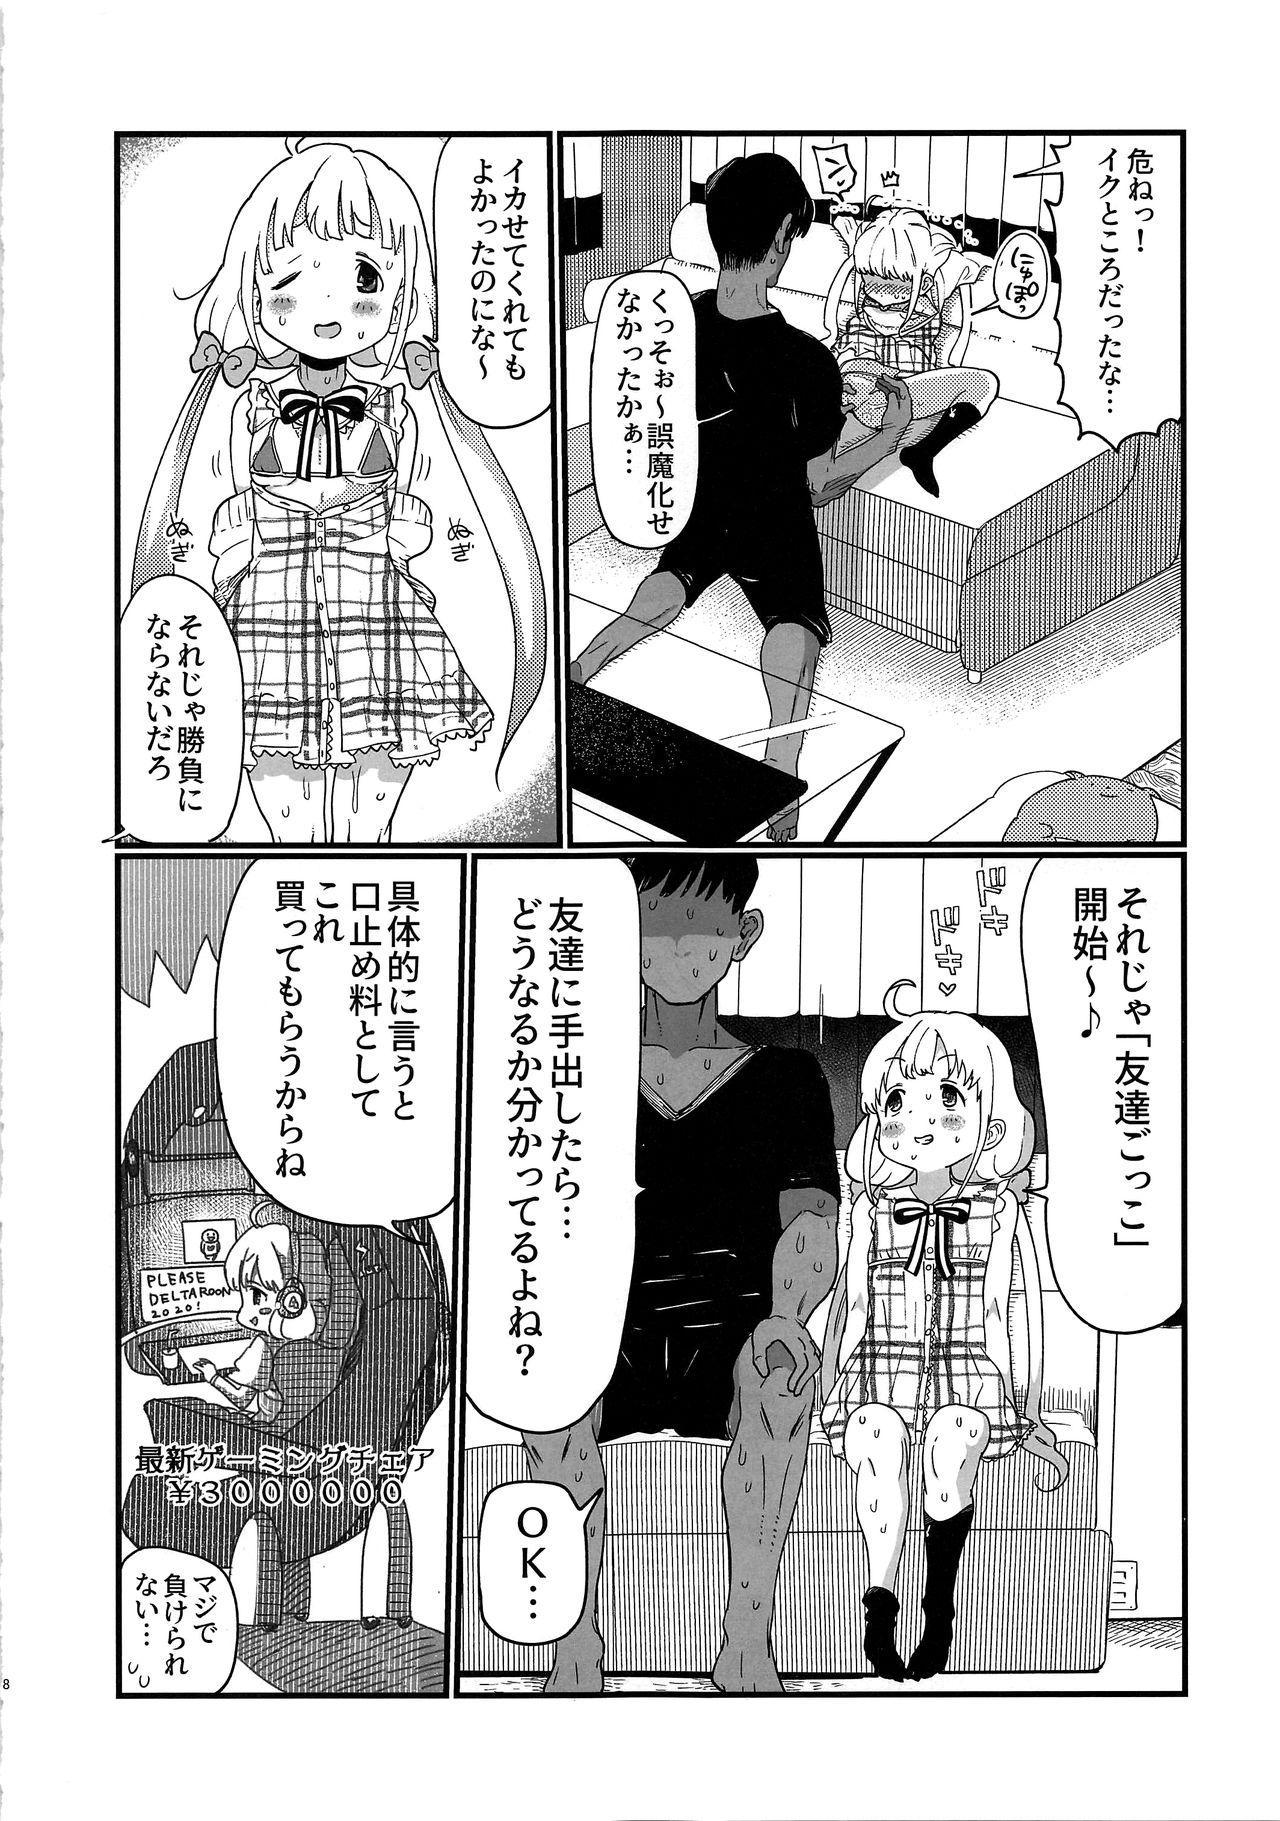 Anzu-chan wa Tomodachi 7